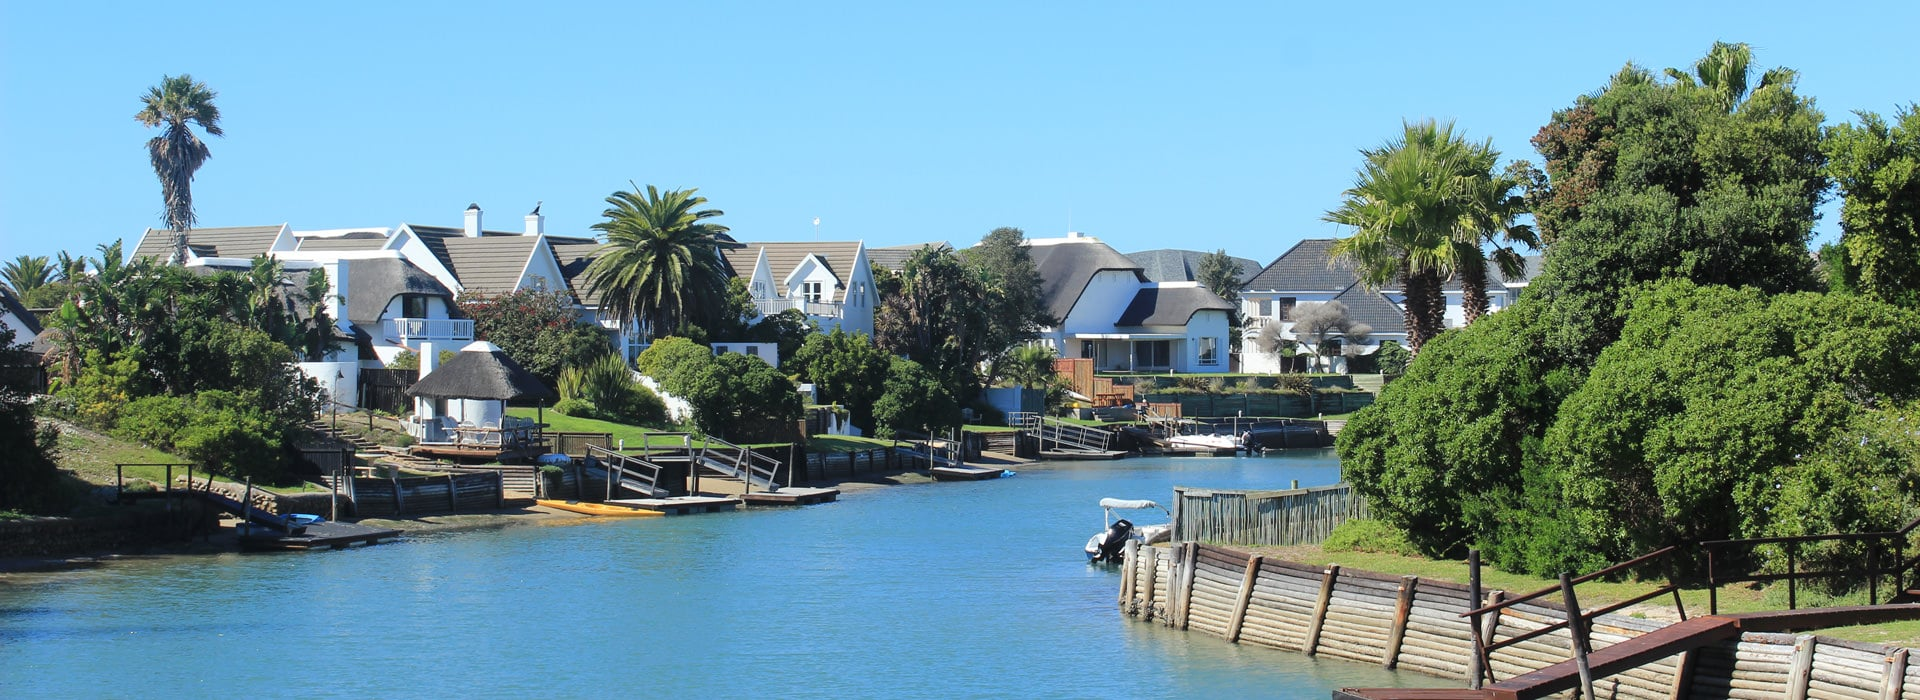 St. Francis Bay Kanal